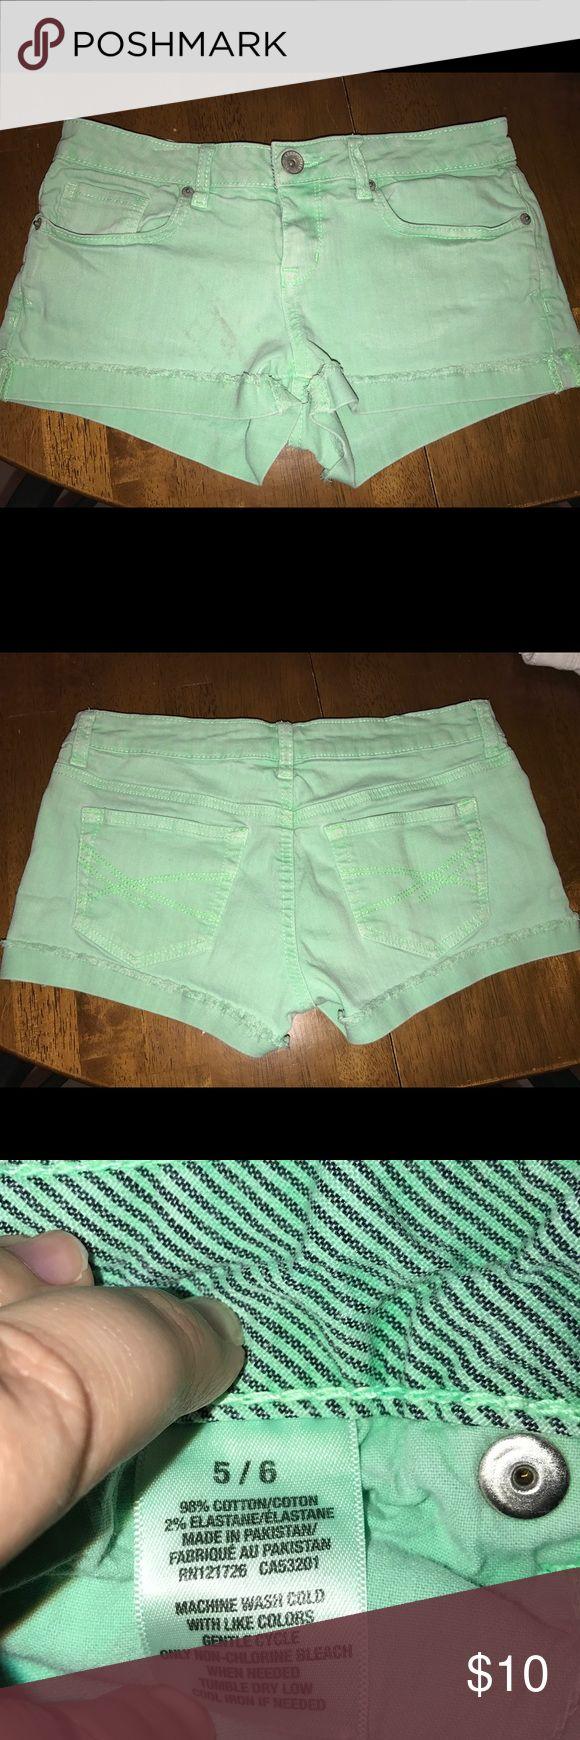 "Aeropostale shorts Aeropostale mint green jean shorts. Has a stain spot on front right leg. Machine wash cold. 98% cotton 2% elastane. Waist 15"" inseam 2"" NO TRADES! #247 Aeropostale Shorts Jean Shorts"